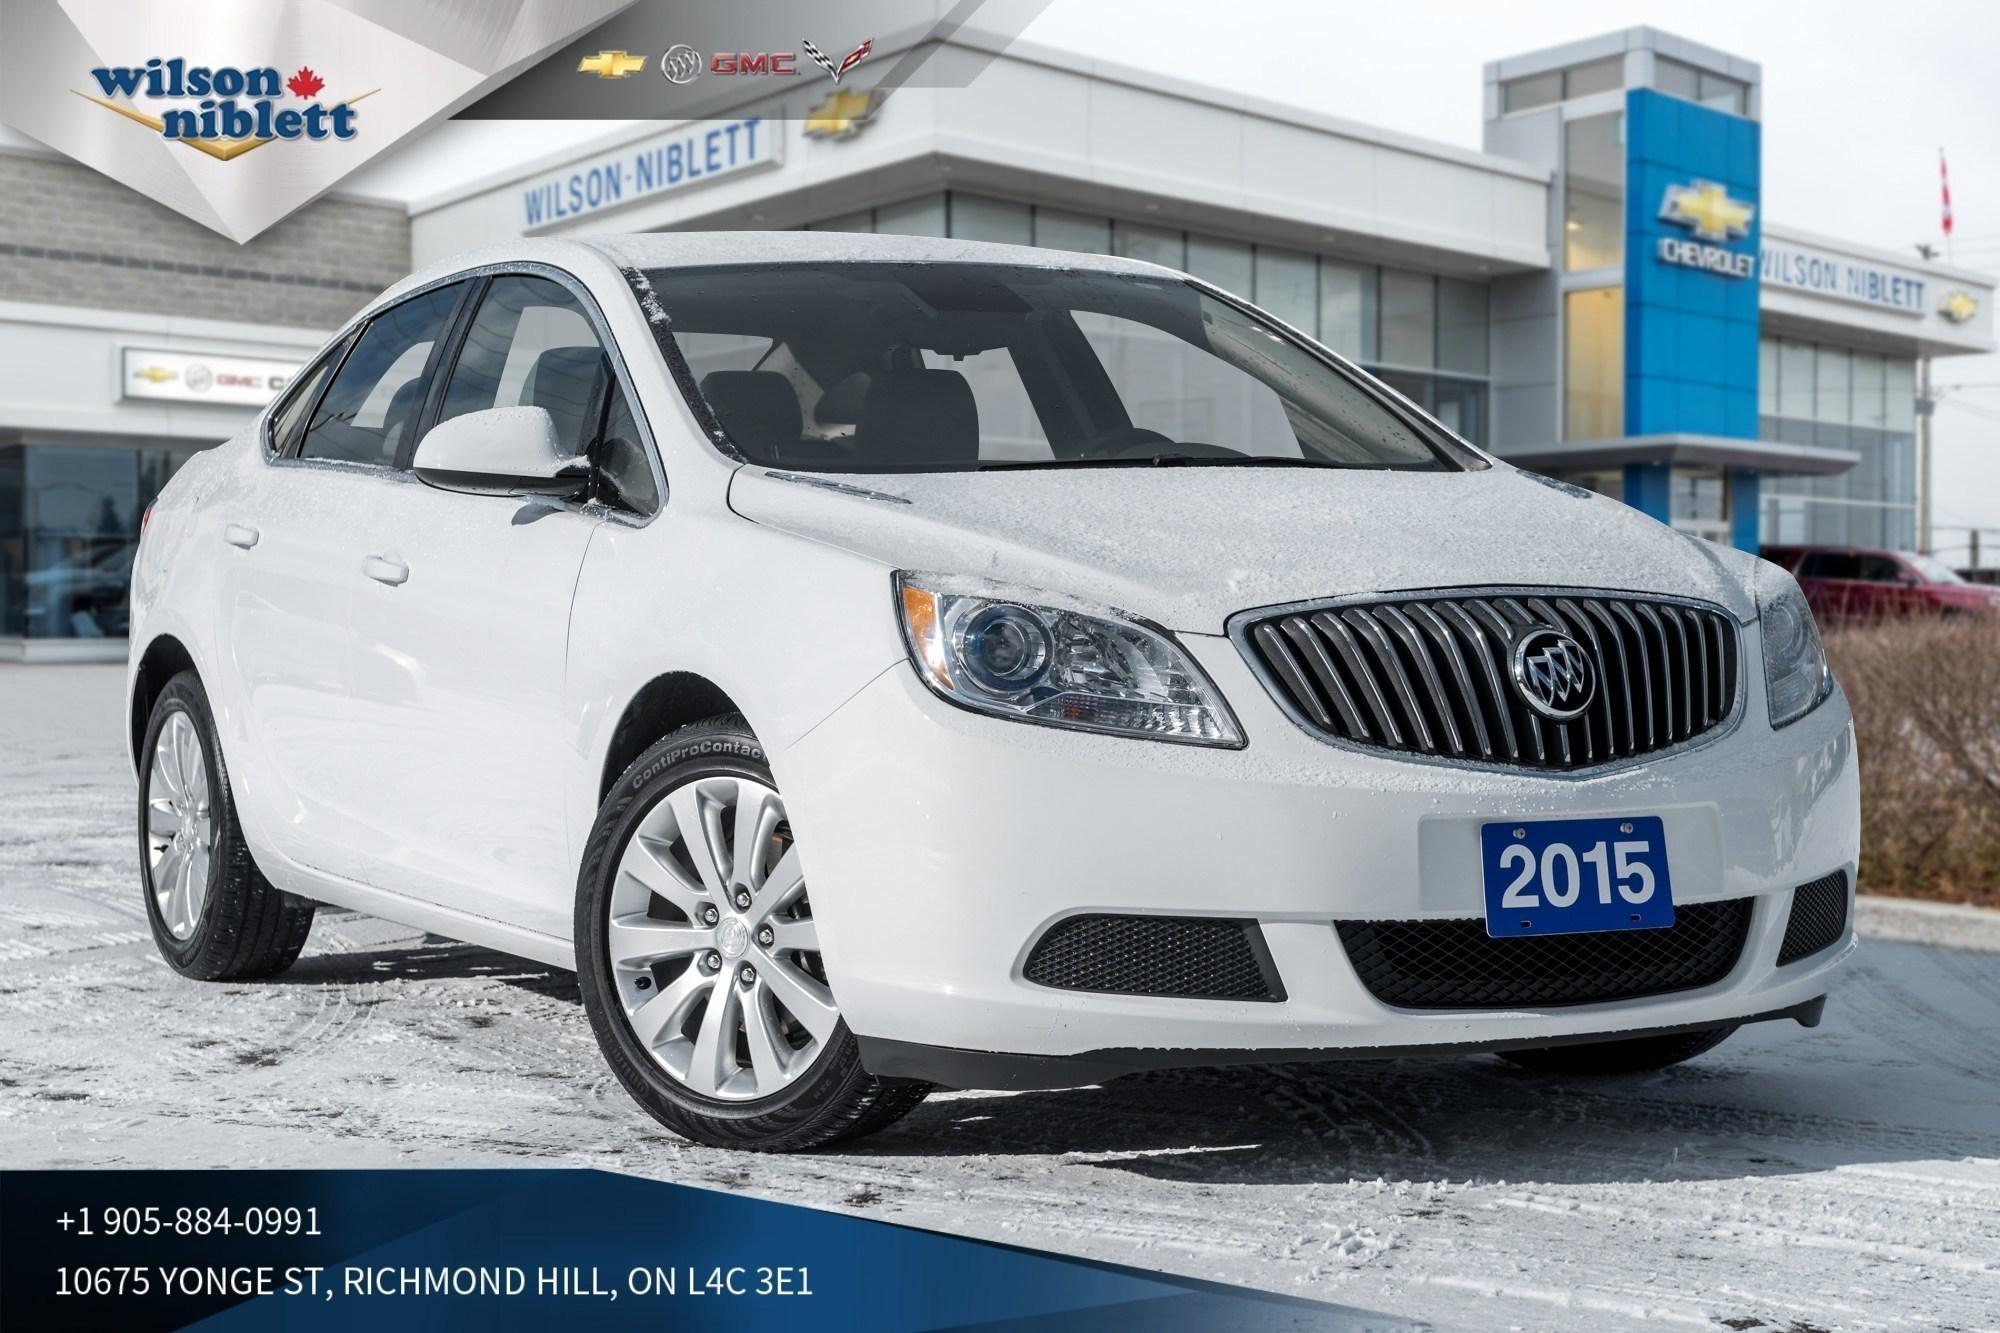 2015 Buick Verano | 4G LTE WIFI HOTSPOT CAPABLE | Sedan